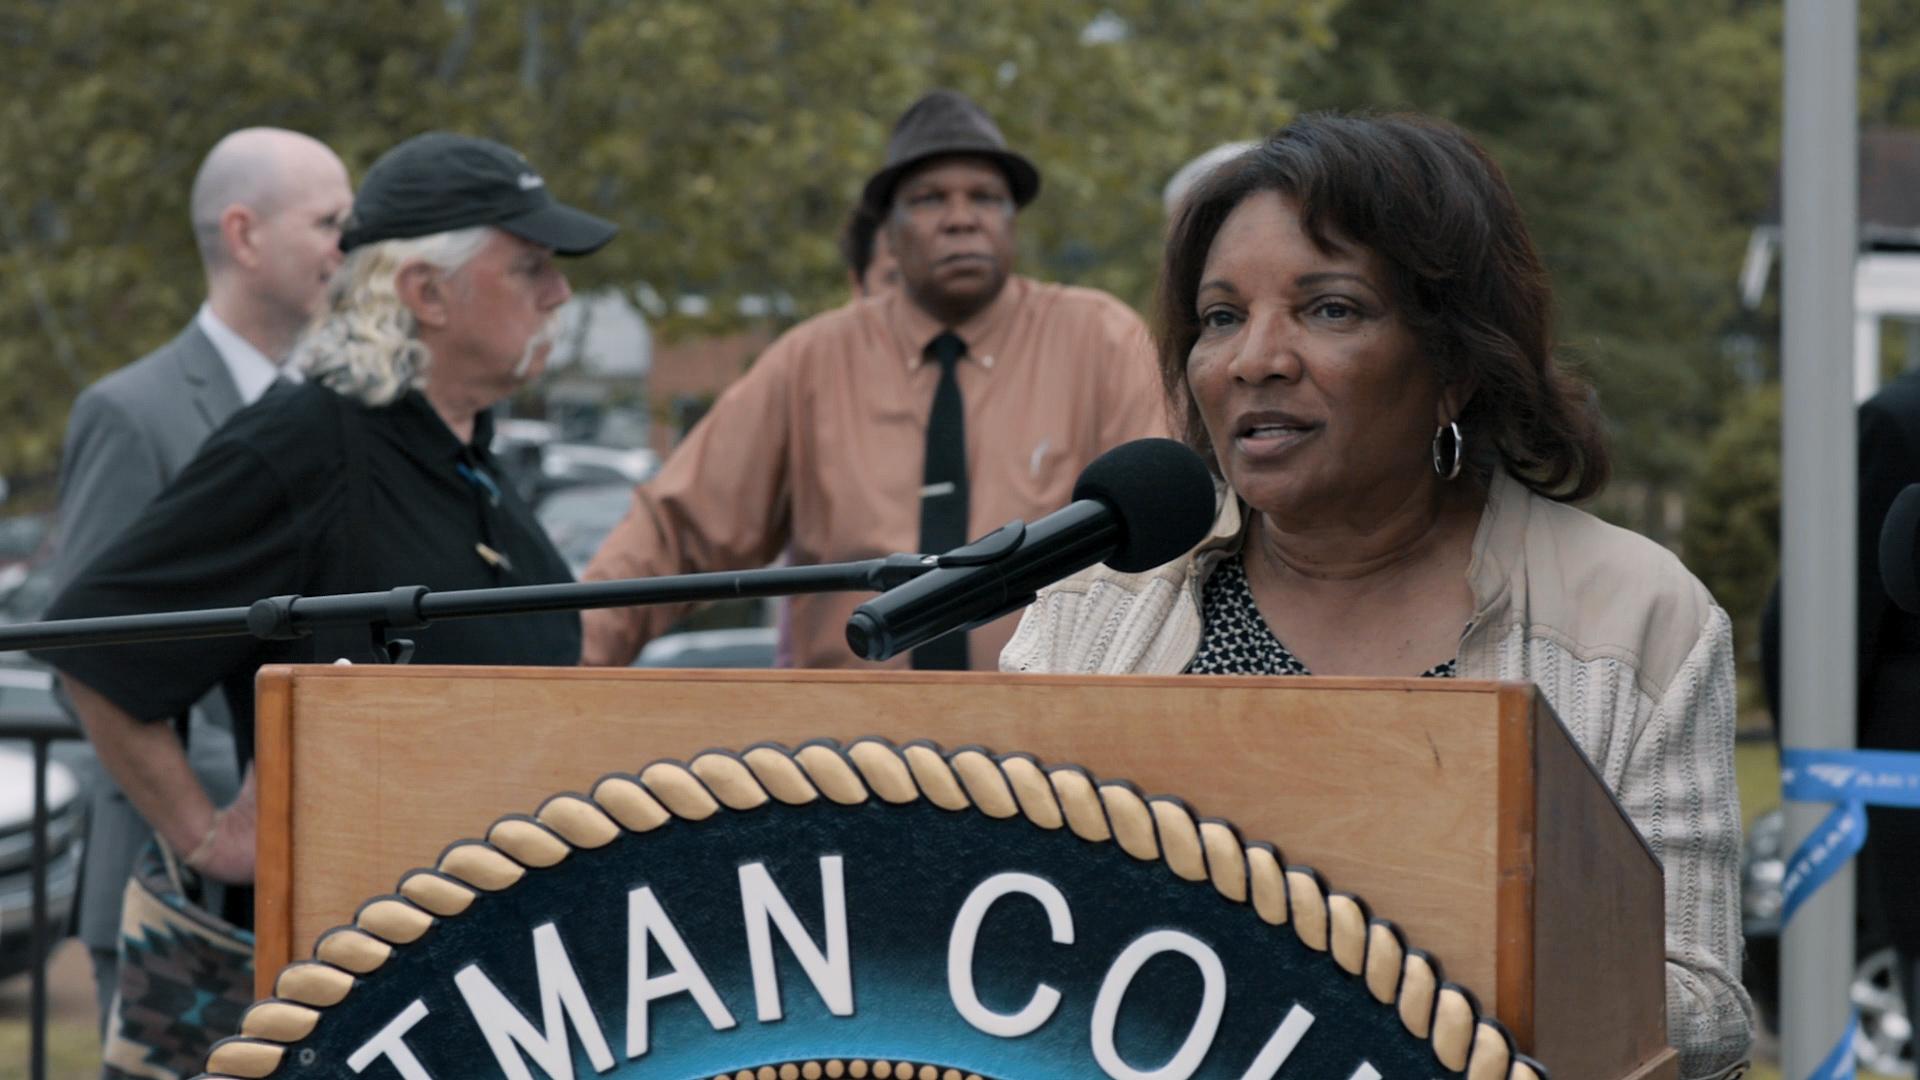 Photo of woman at podium, speaking